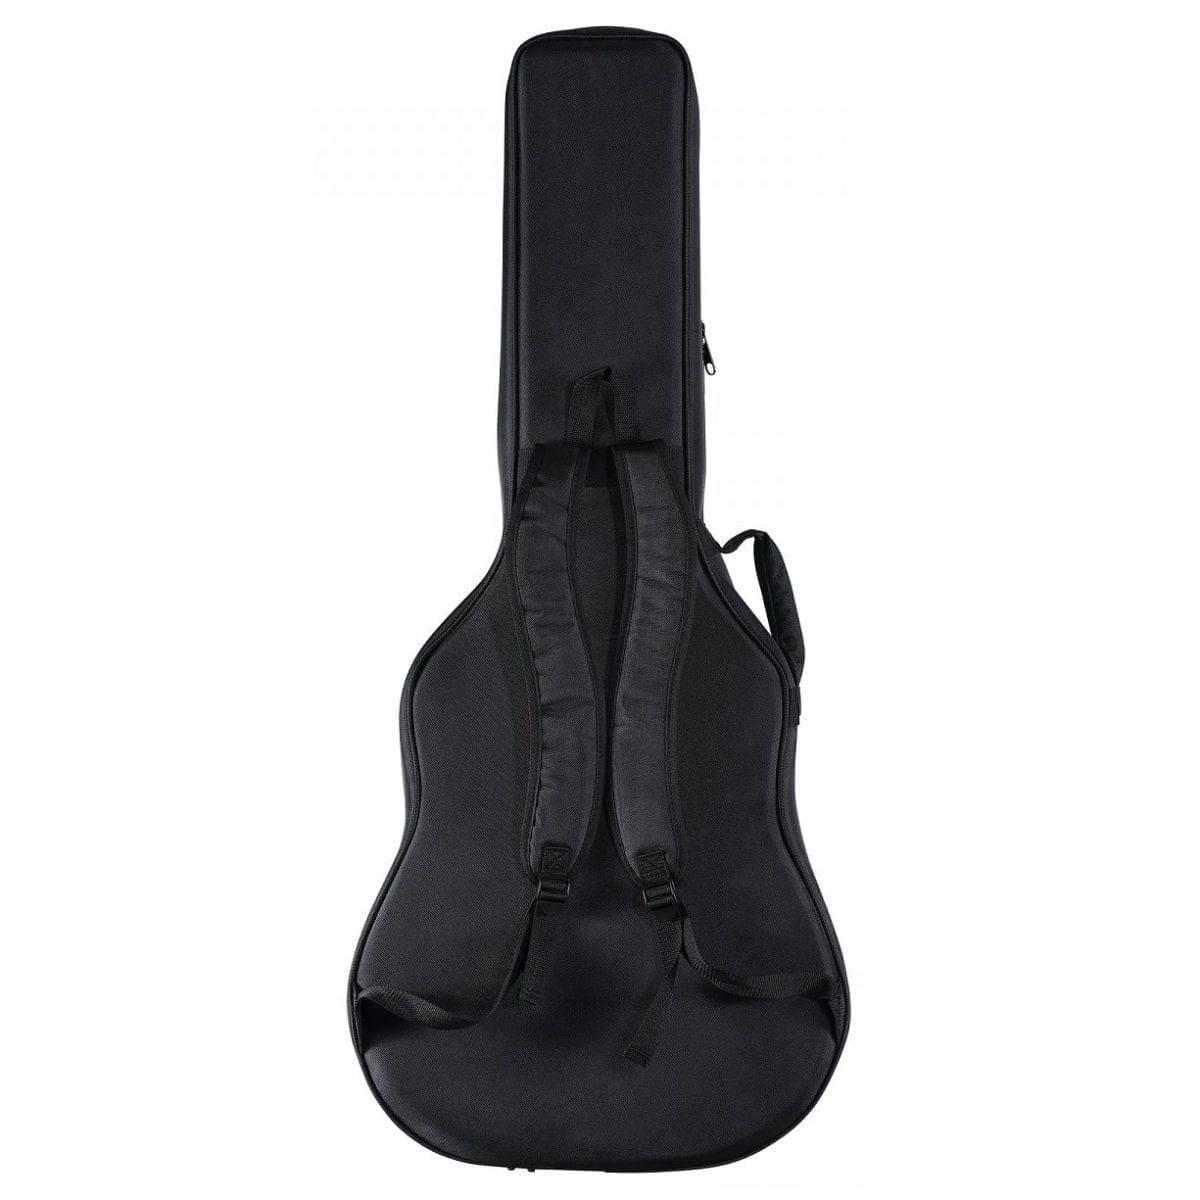 קייס חצי קשיח Alvarez Flexicase לגיטרה אקוסטית-15701